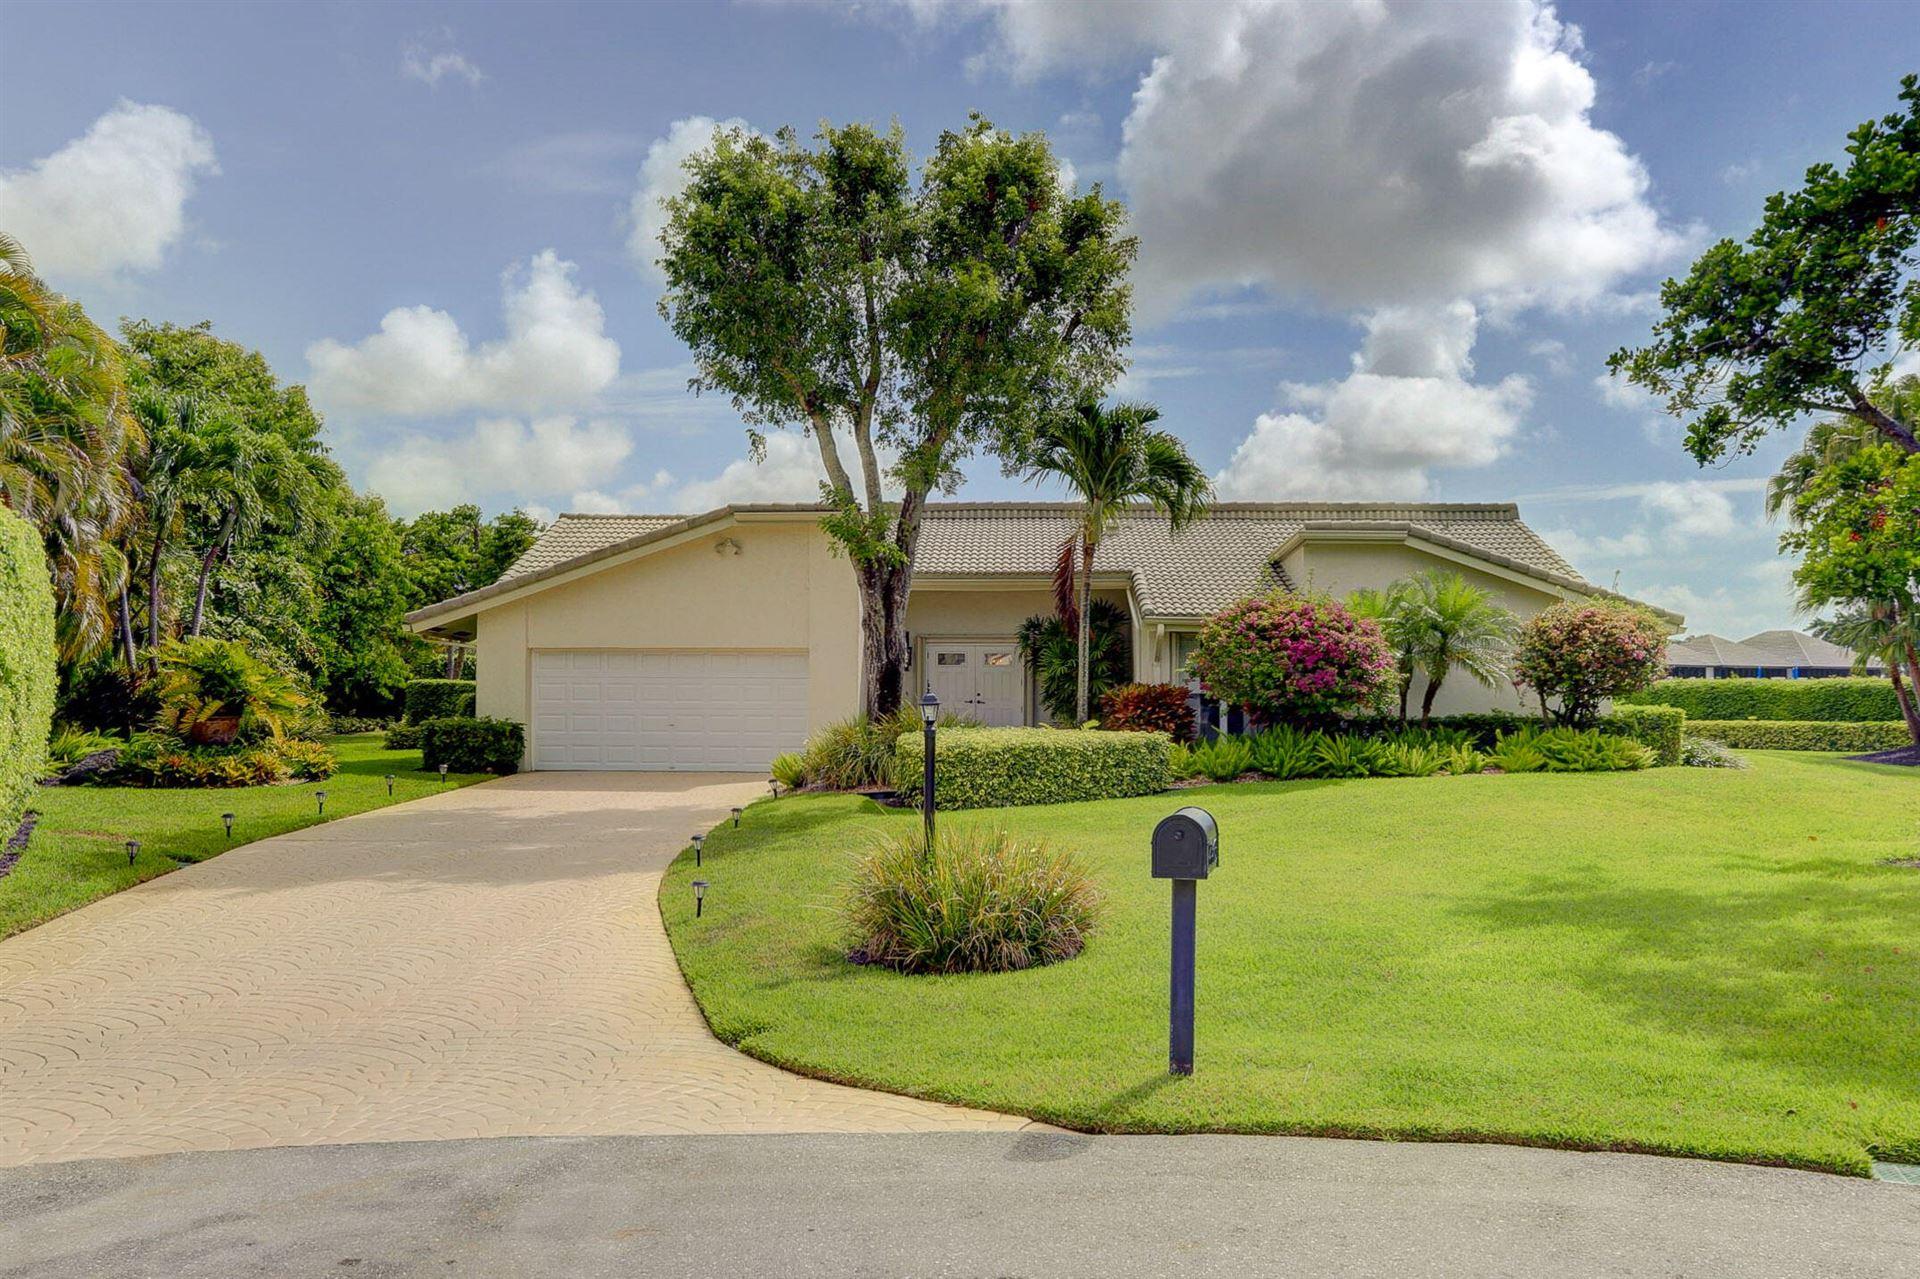 4463 Cocoplum Way, Delray Beach, FL 33445 - MLS#: RX-10722887